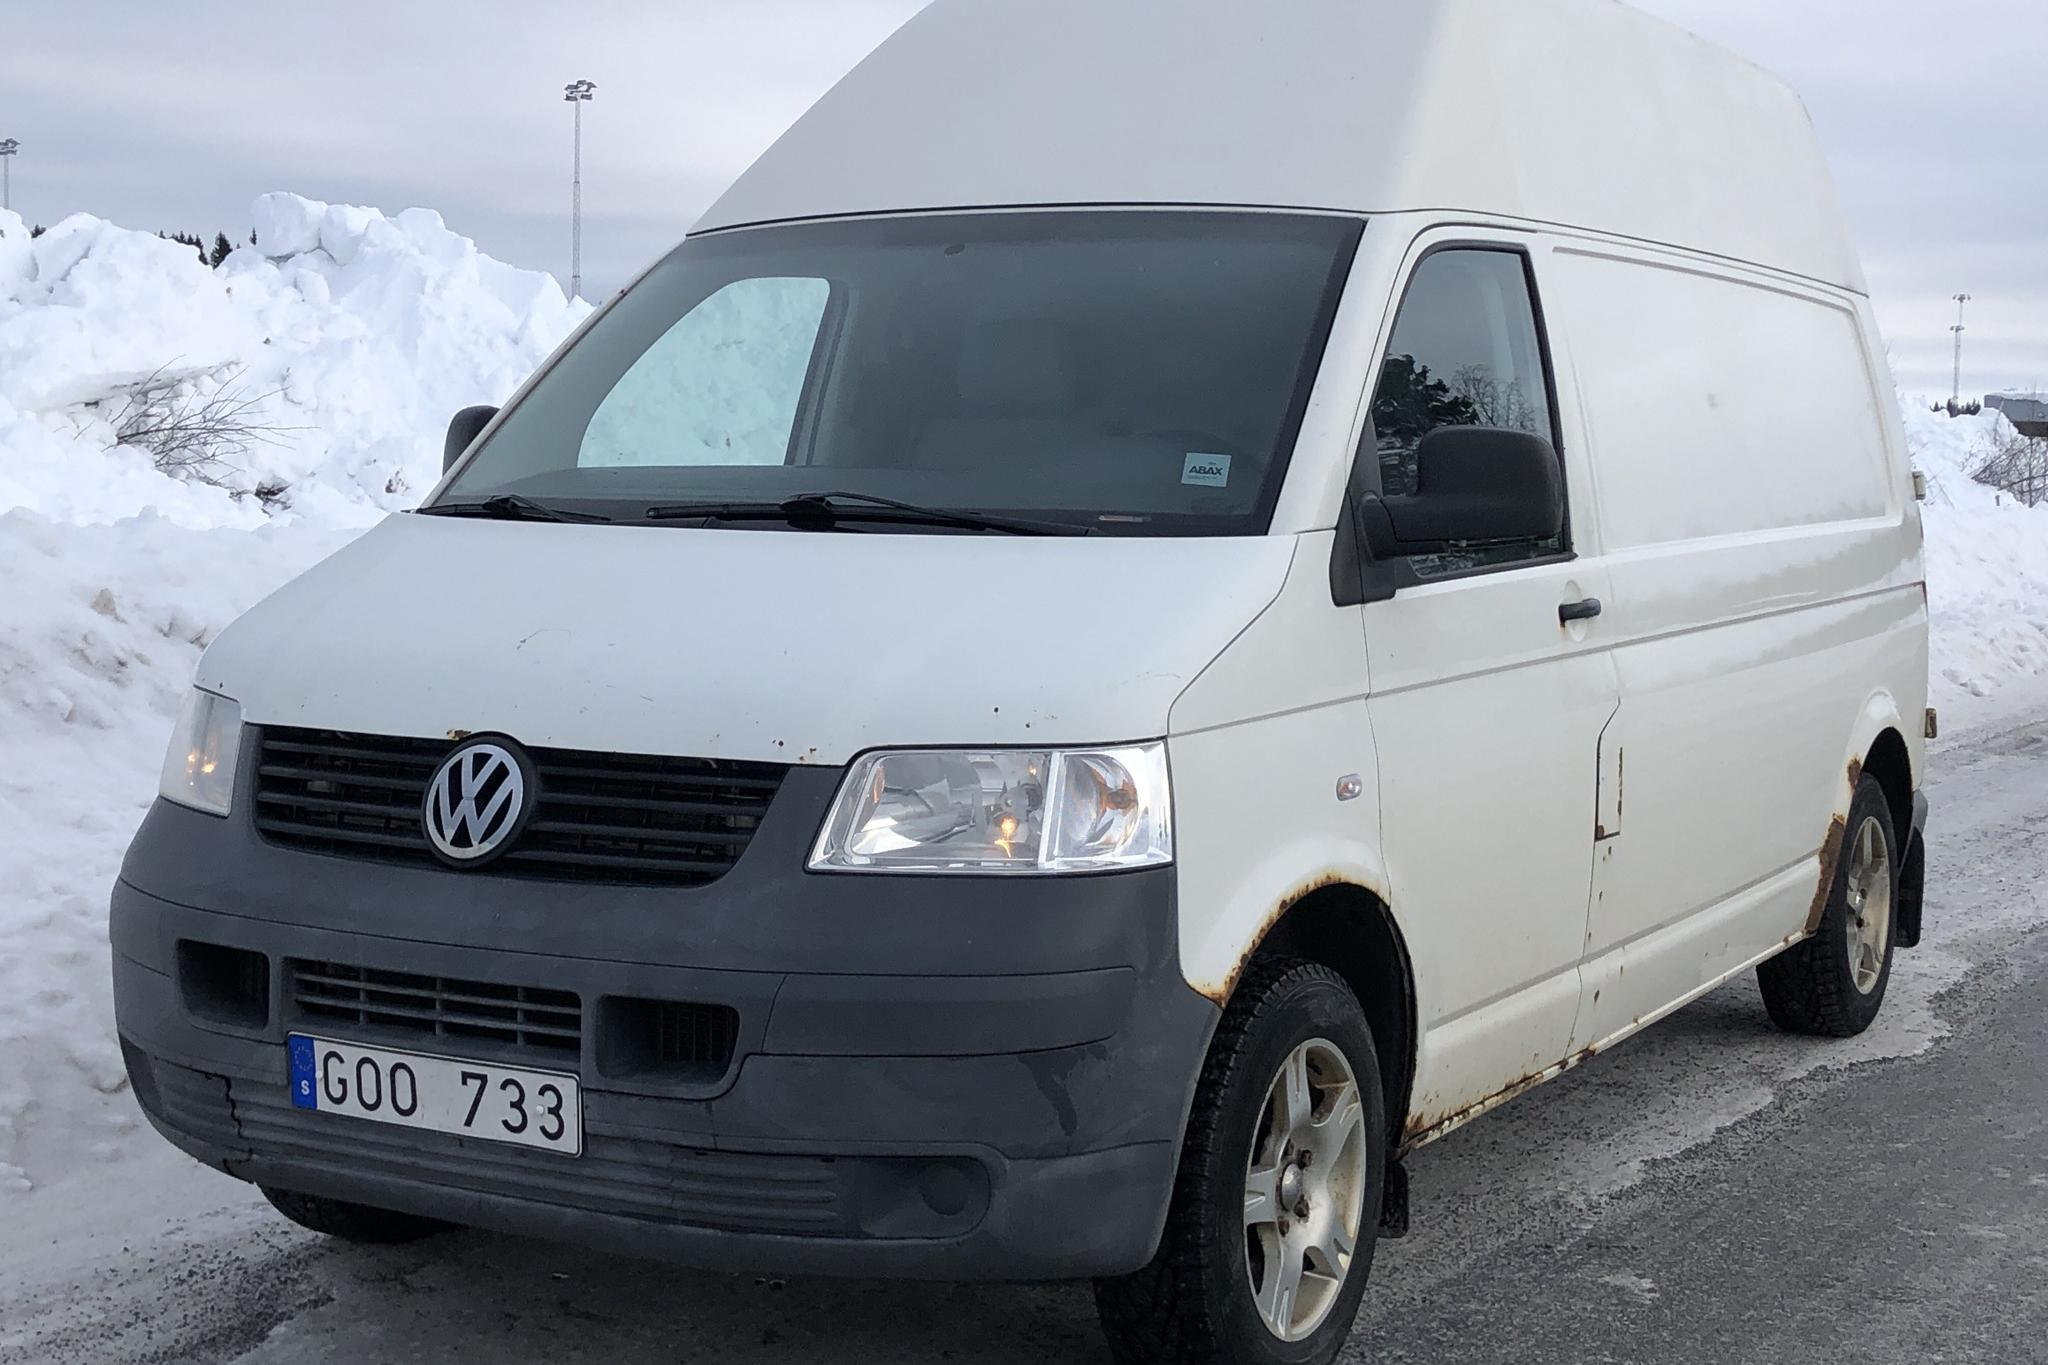 VW Transporter T5 2.5 TDI (130hk) - 212 560 km - Manual - white - 2008